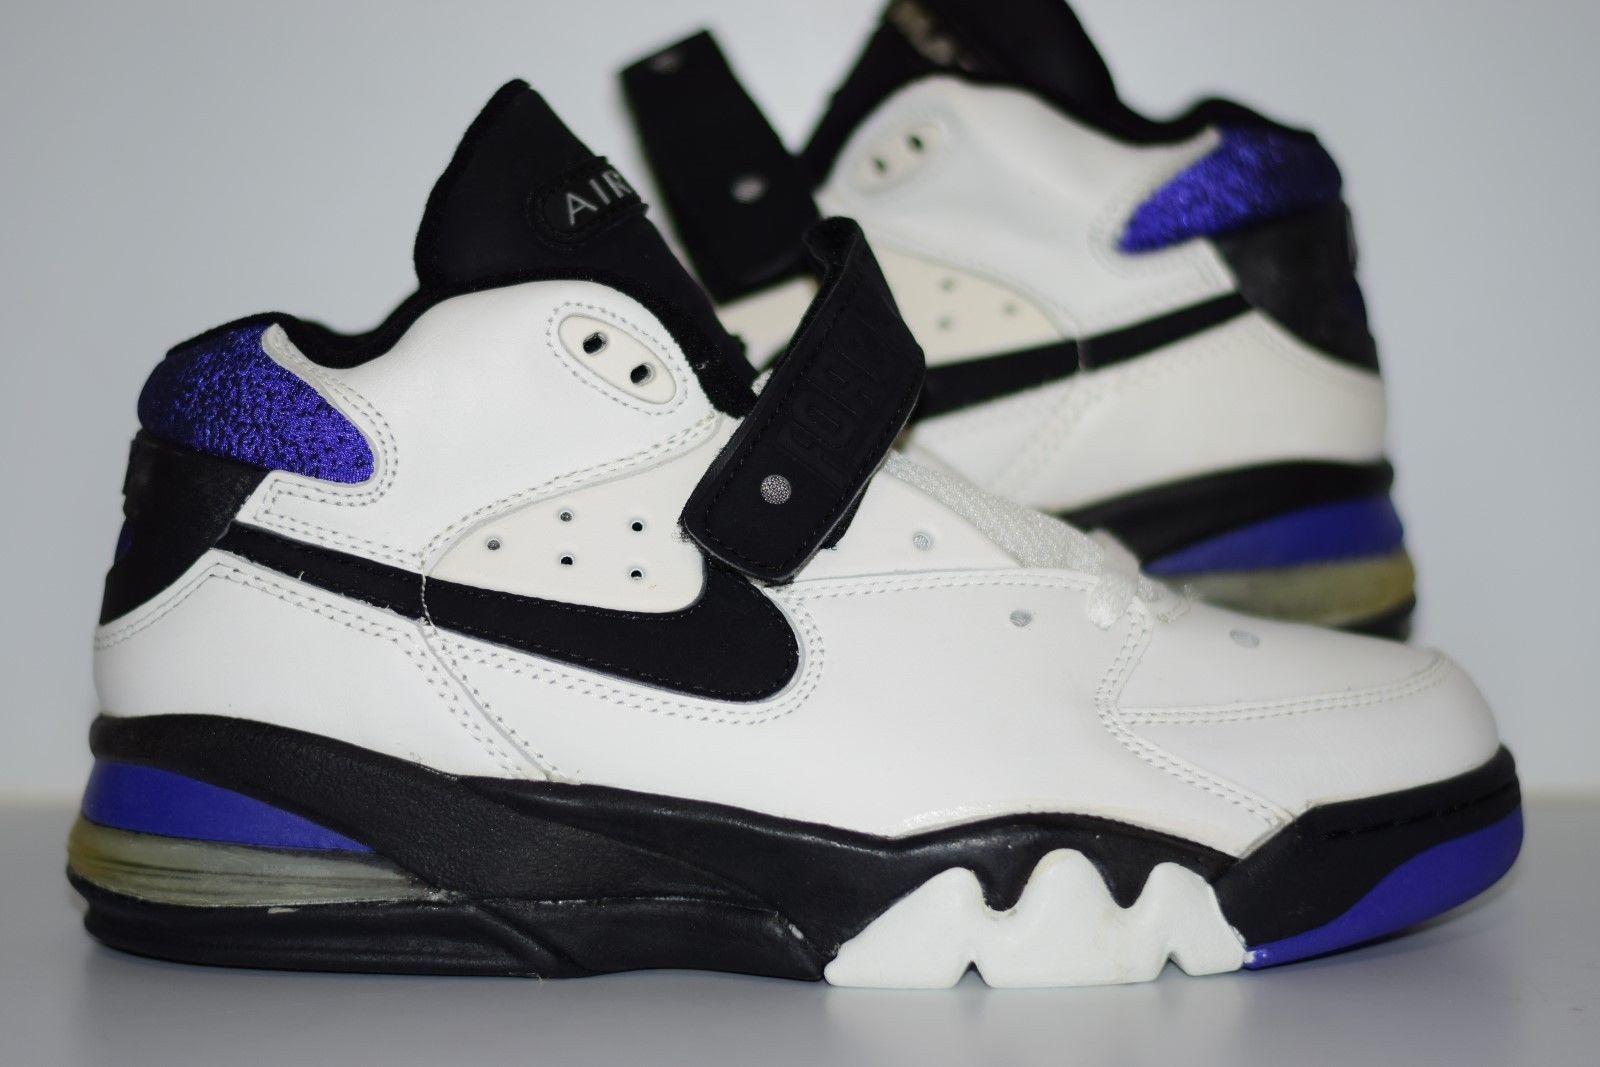 sale retailer d2cc7 ebf1a ... Size 10   OG 1993 Nike Air Force Max CB Cobalt Suns Charles Barkley -  Thumbnail ...